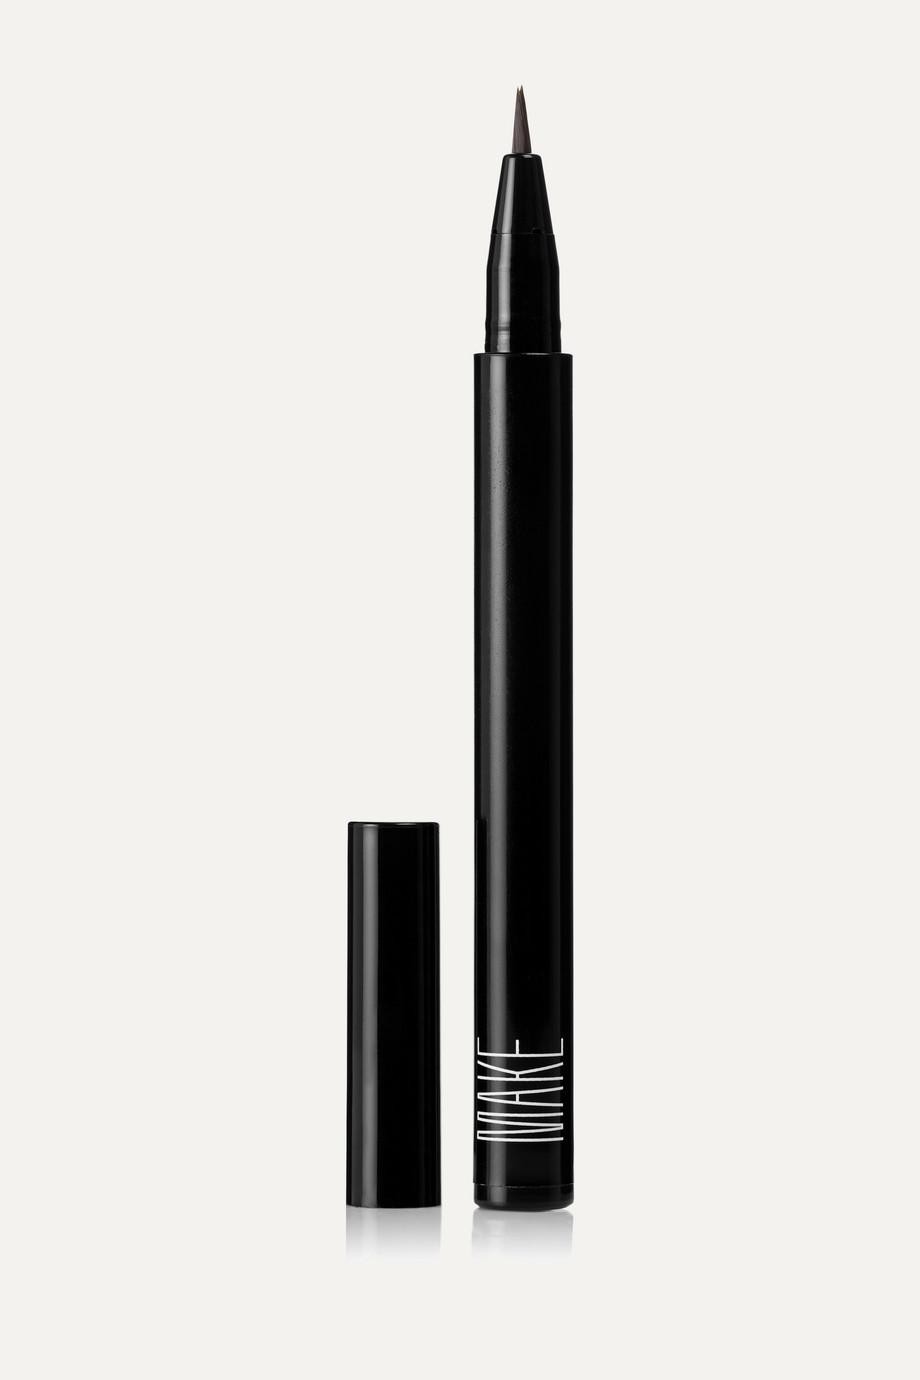 MAKE Beauty Brow Pen - Cool